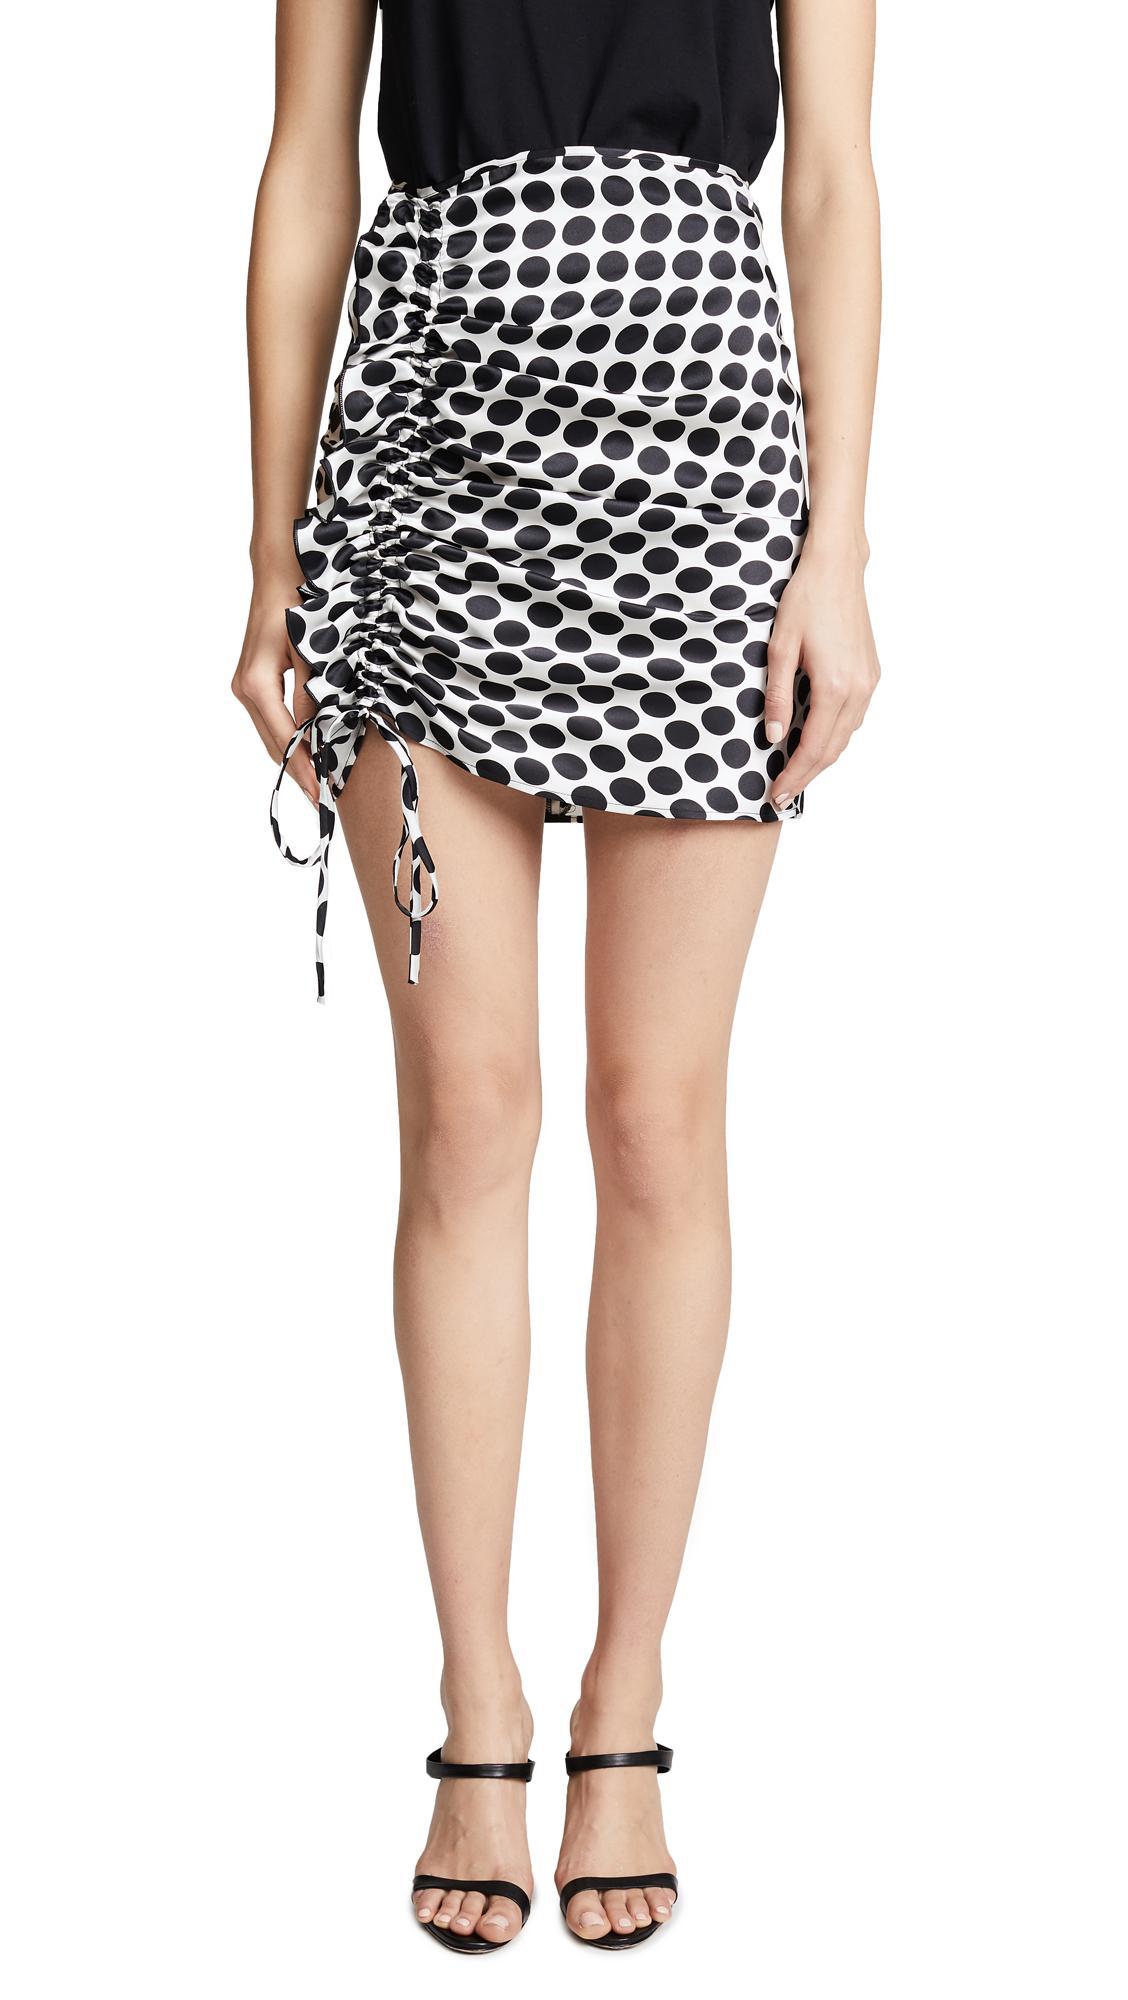 Delfi Collective Nia Skirt In Black